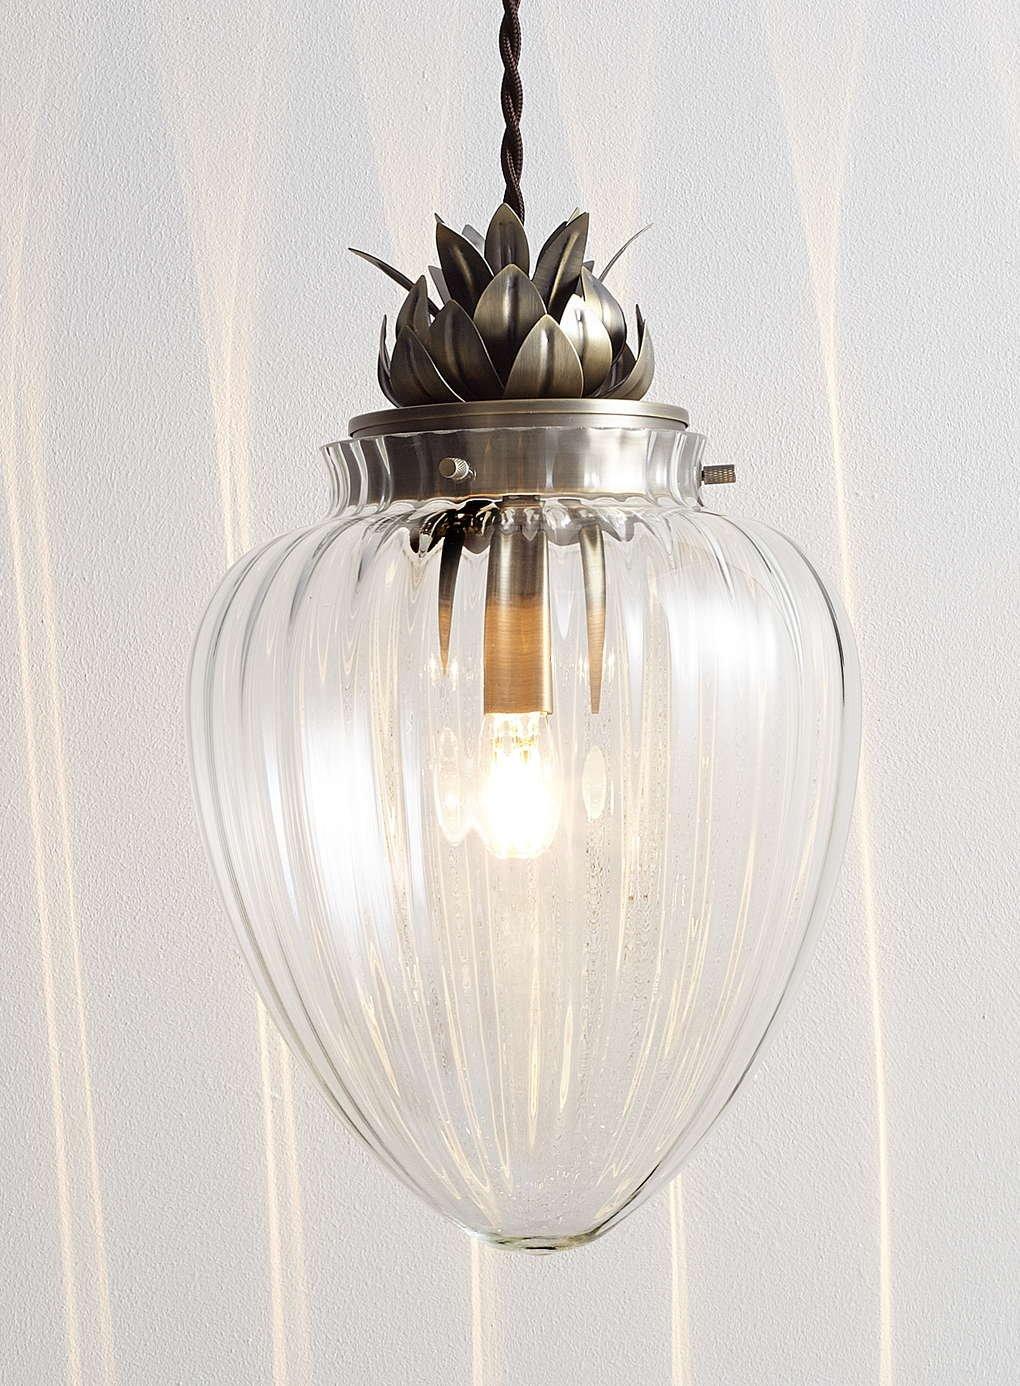 Pinele Ceiling Pendant Light